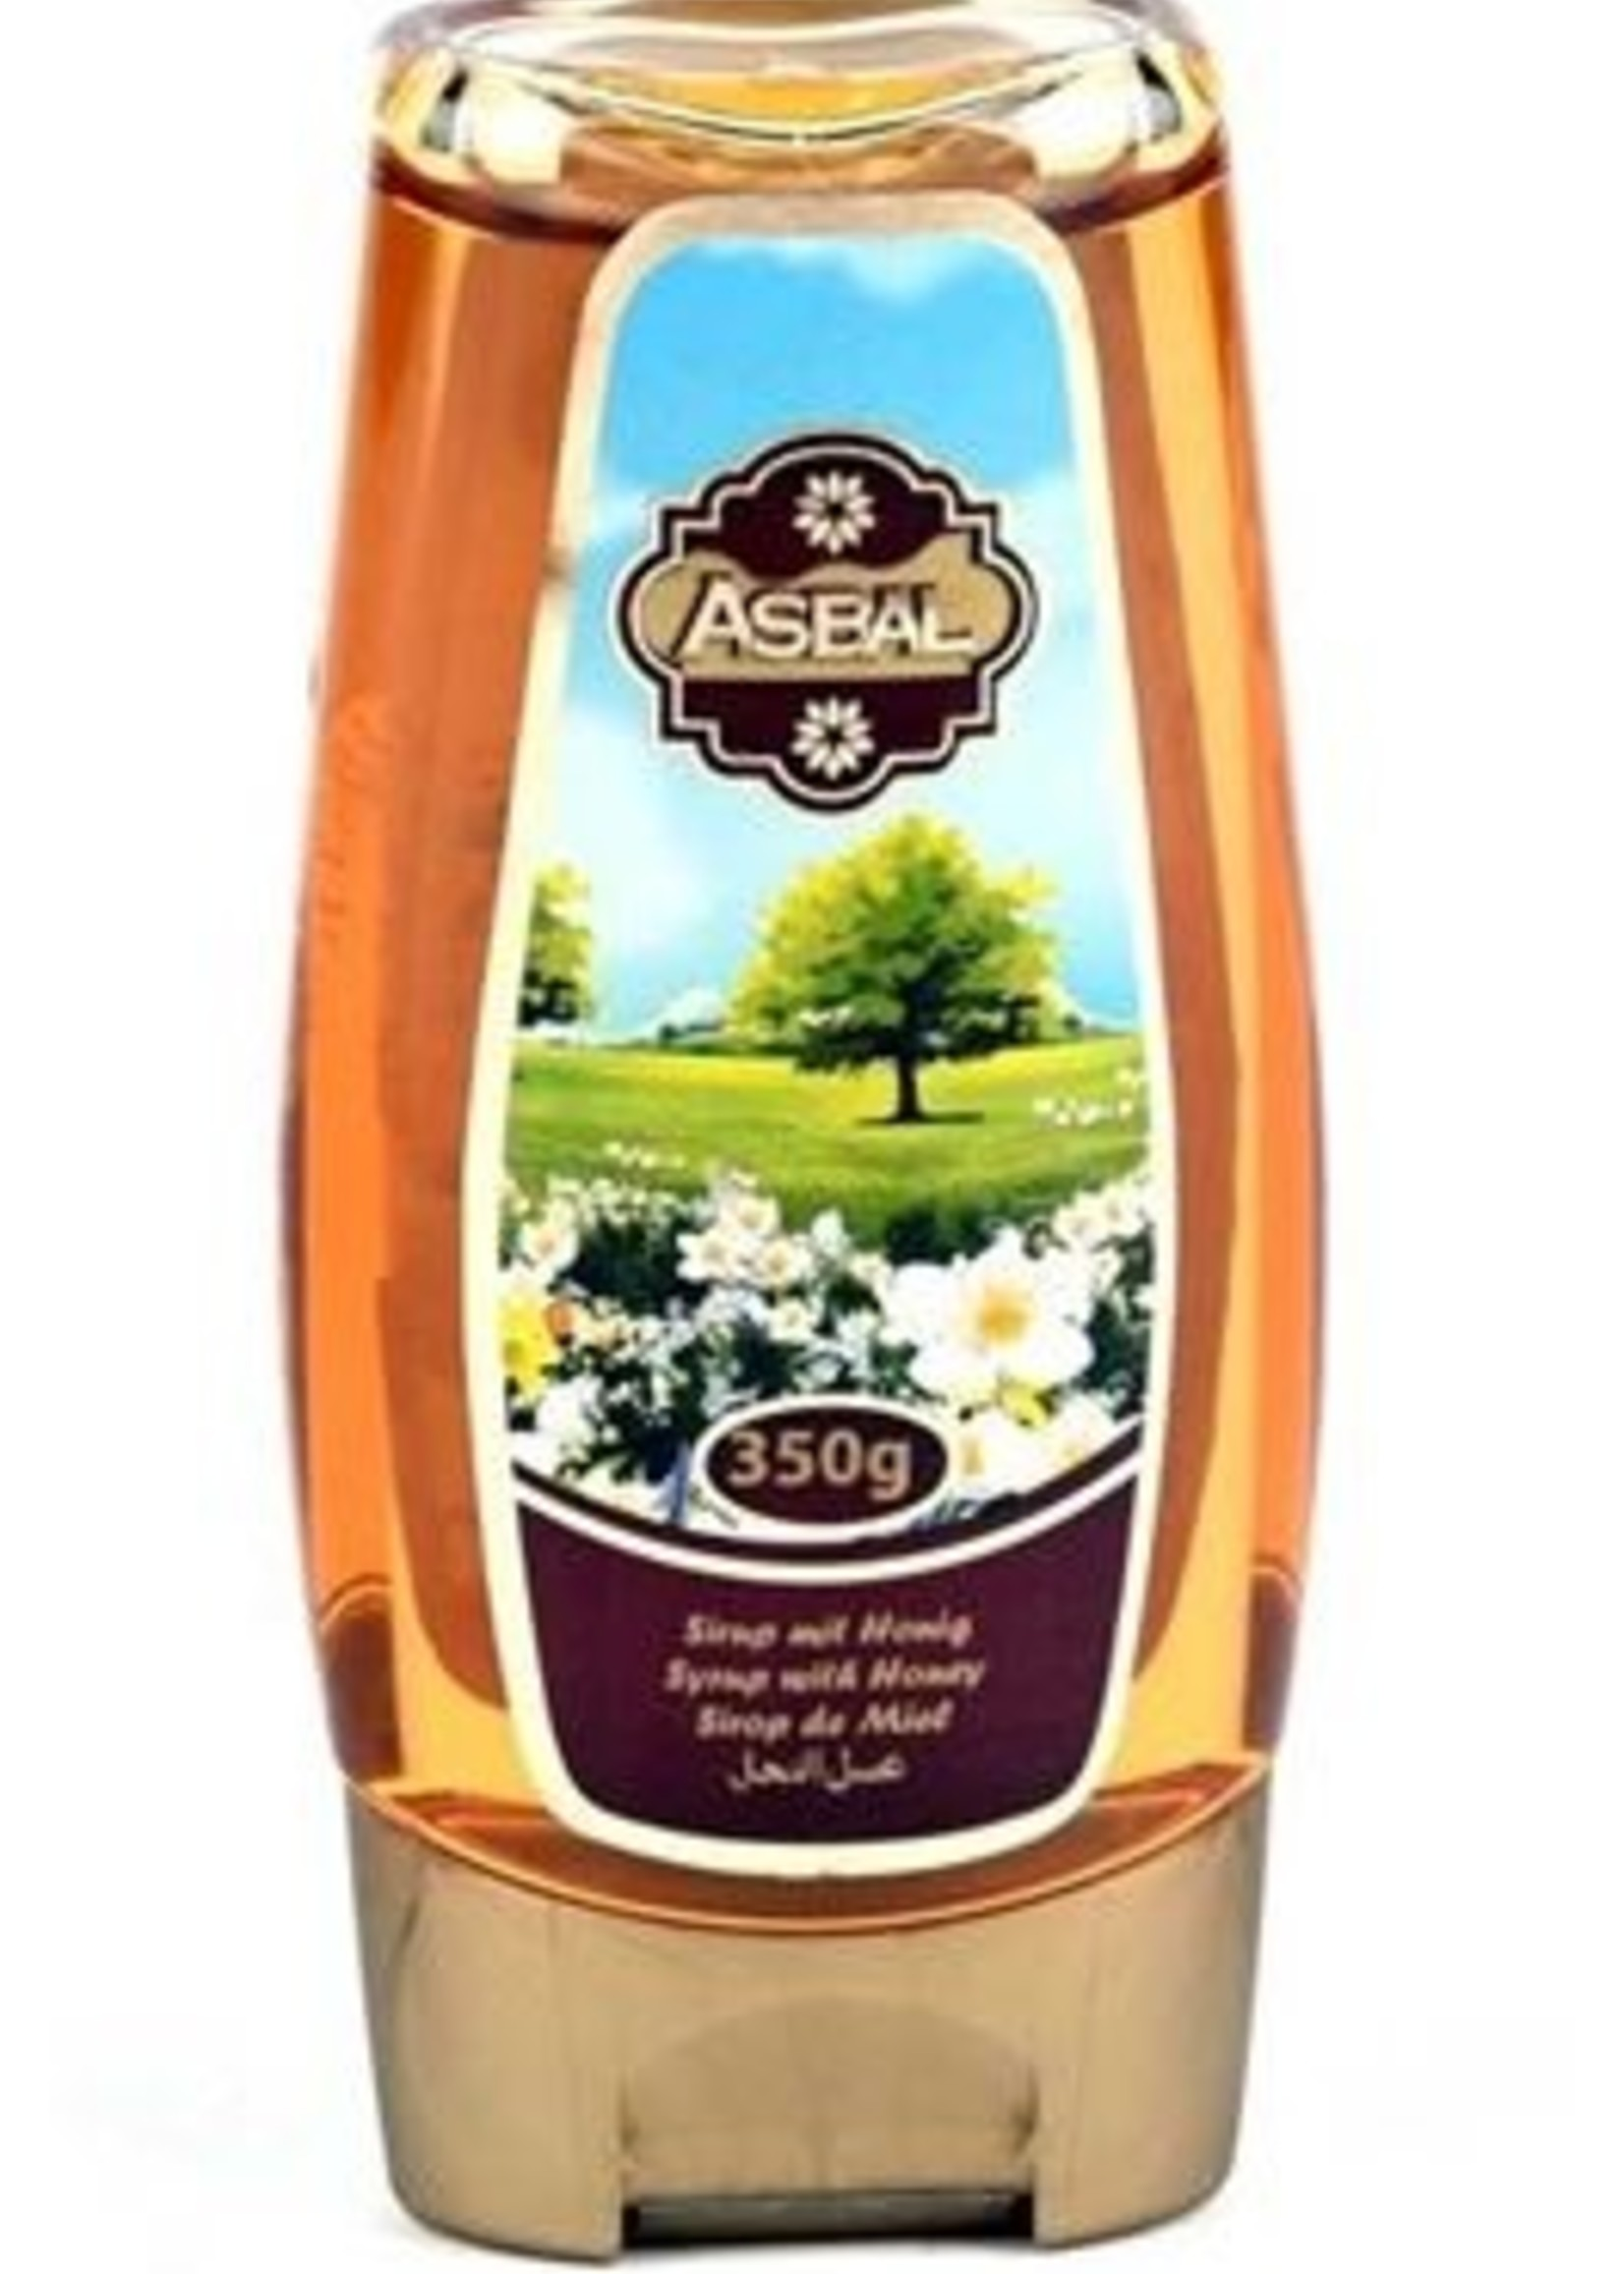 Asbal Bloemenhoning 350 gram